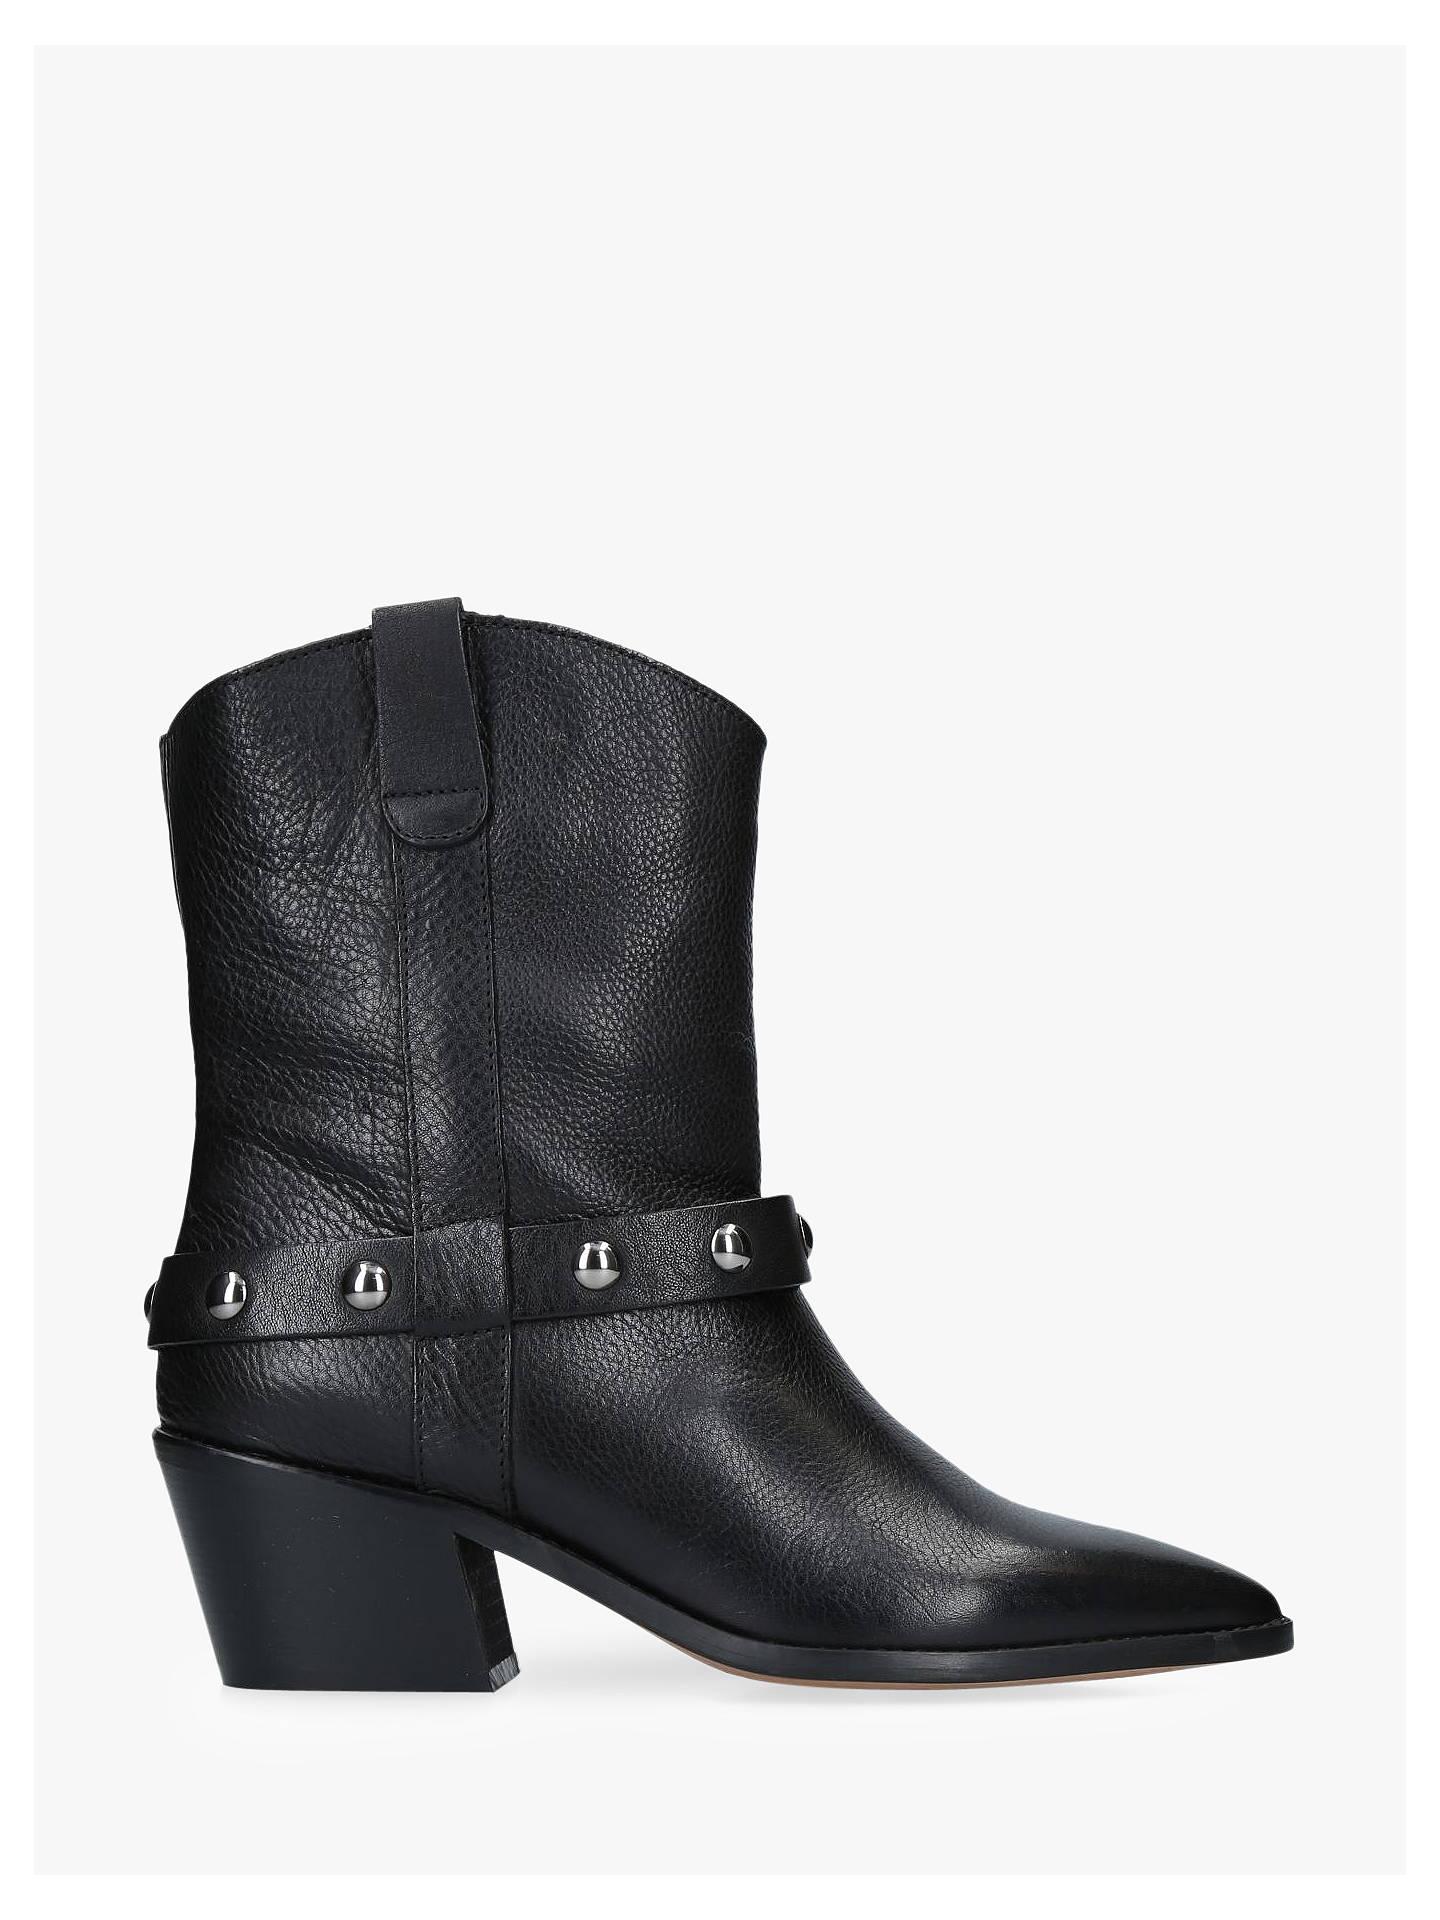 6ec179e63a4c7 Buy Carvela Sage Block Heel Ankle Boots